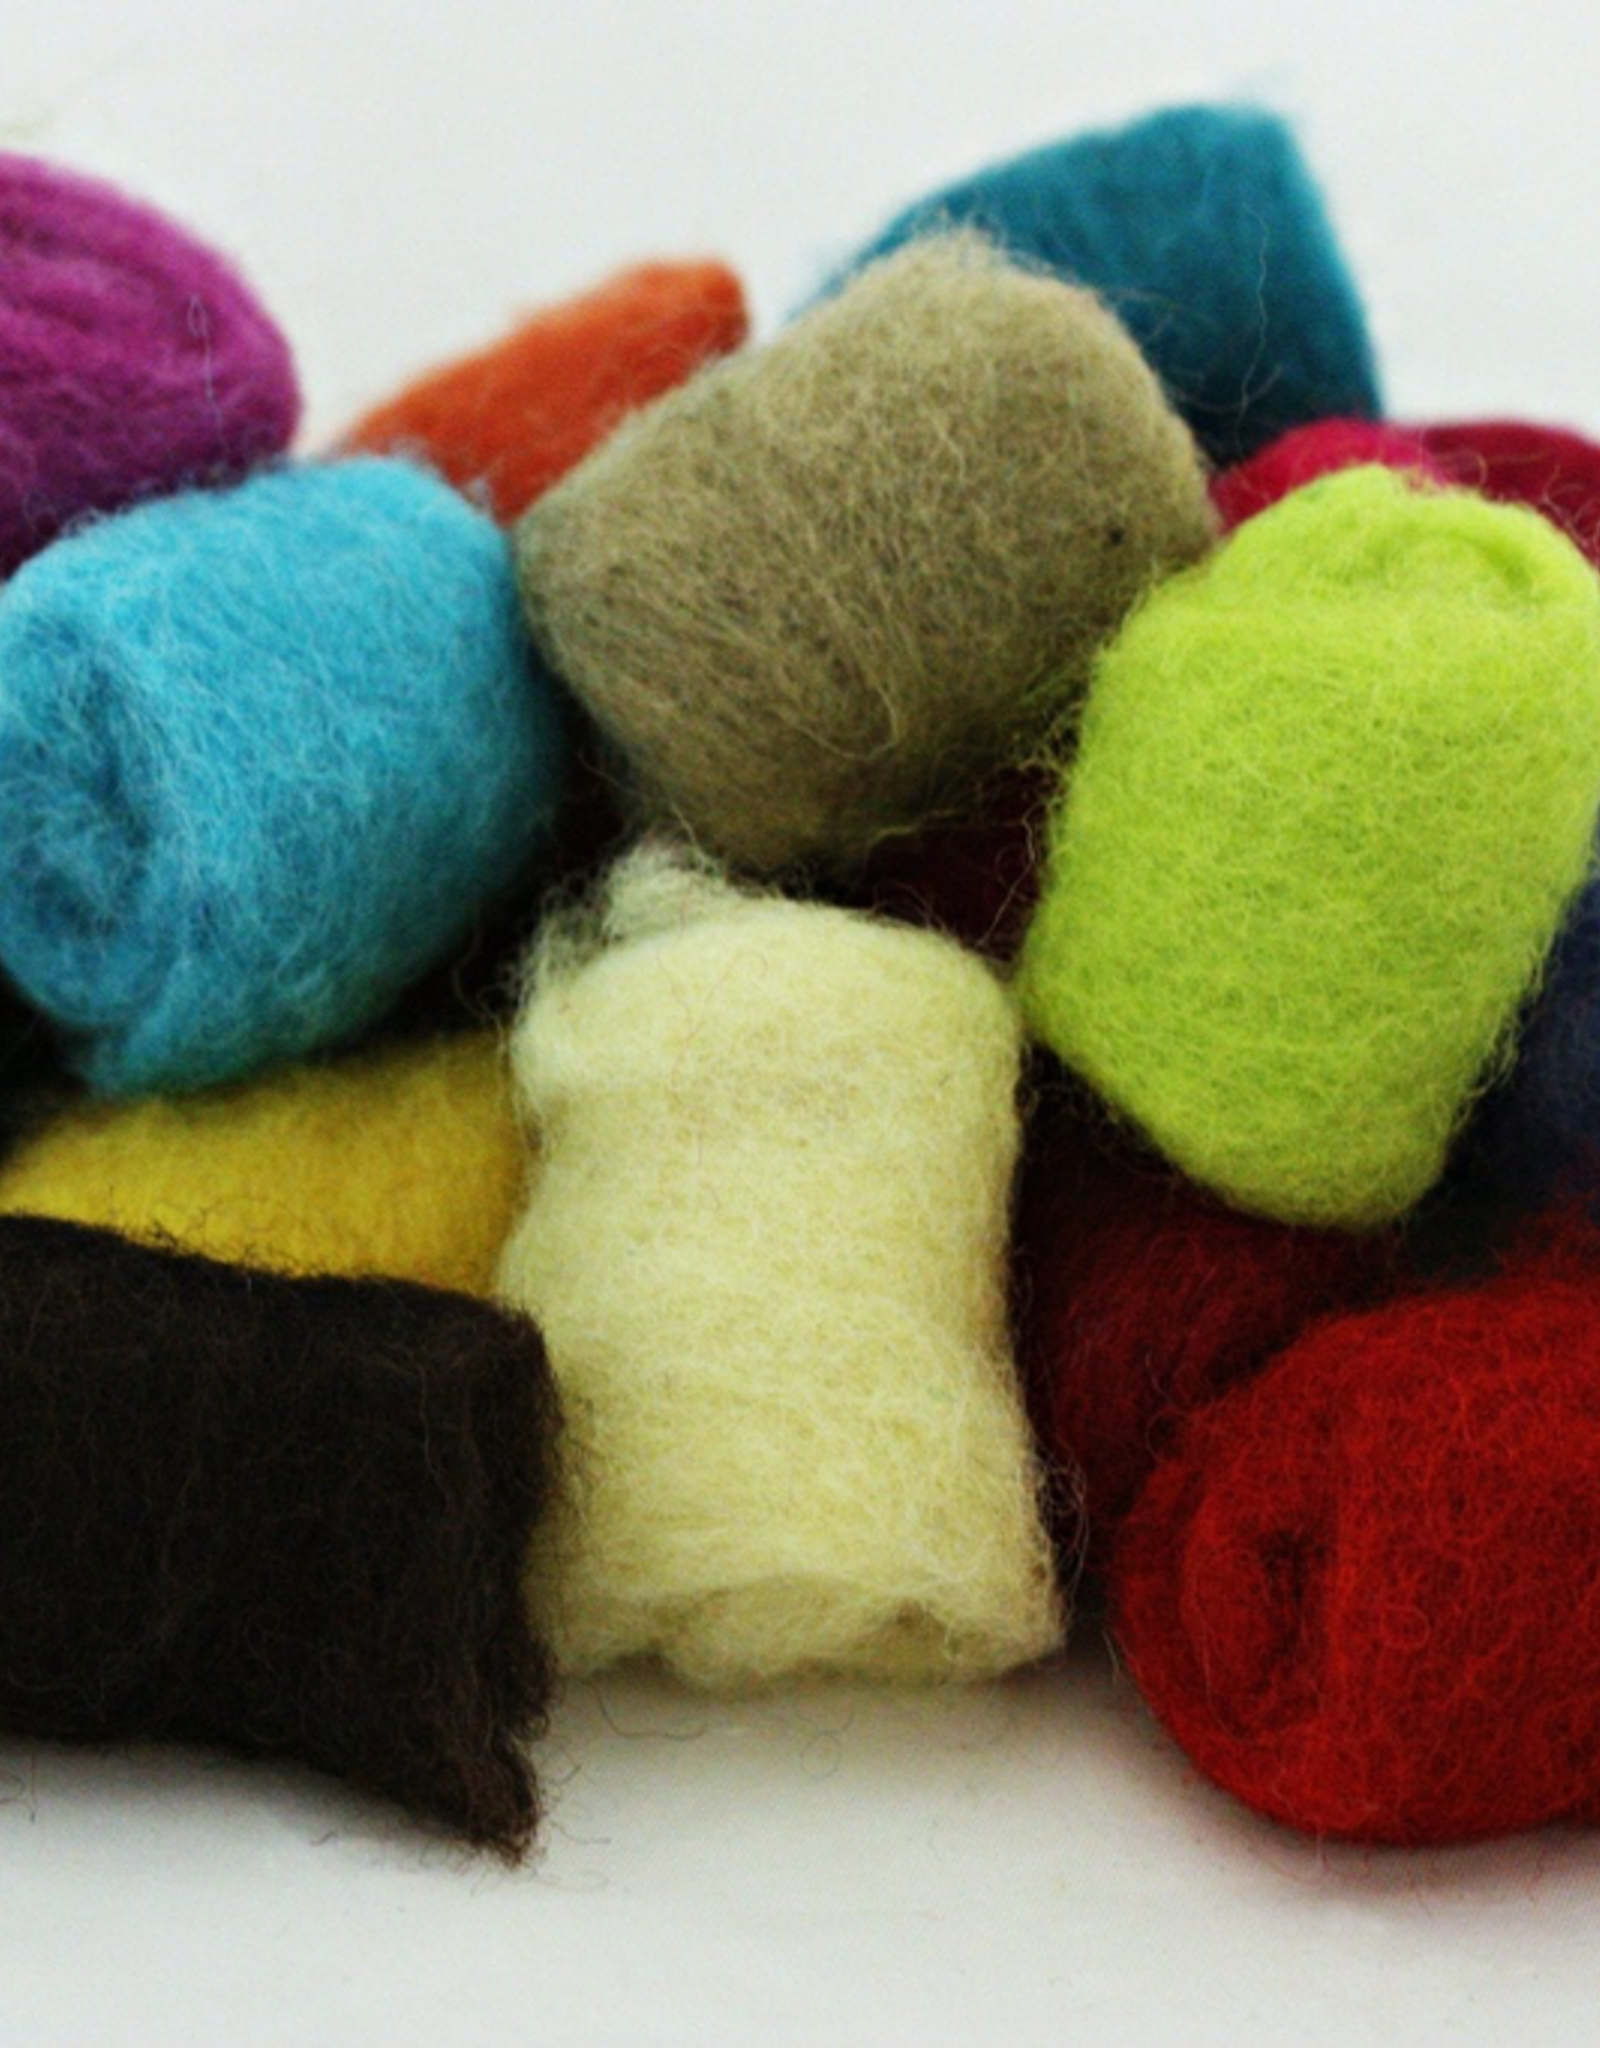 Frabjous Fibers Gumballs needle felting wool by Frabjous Fibers assorted colors